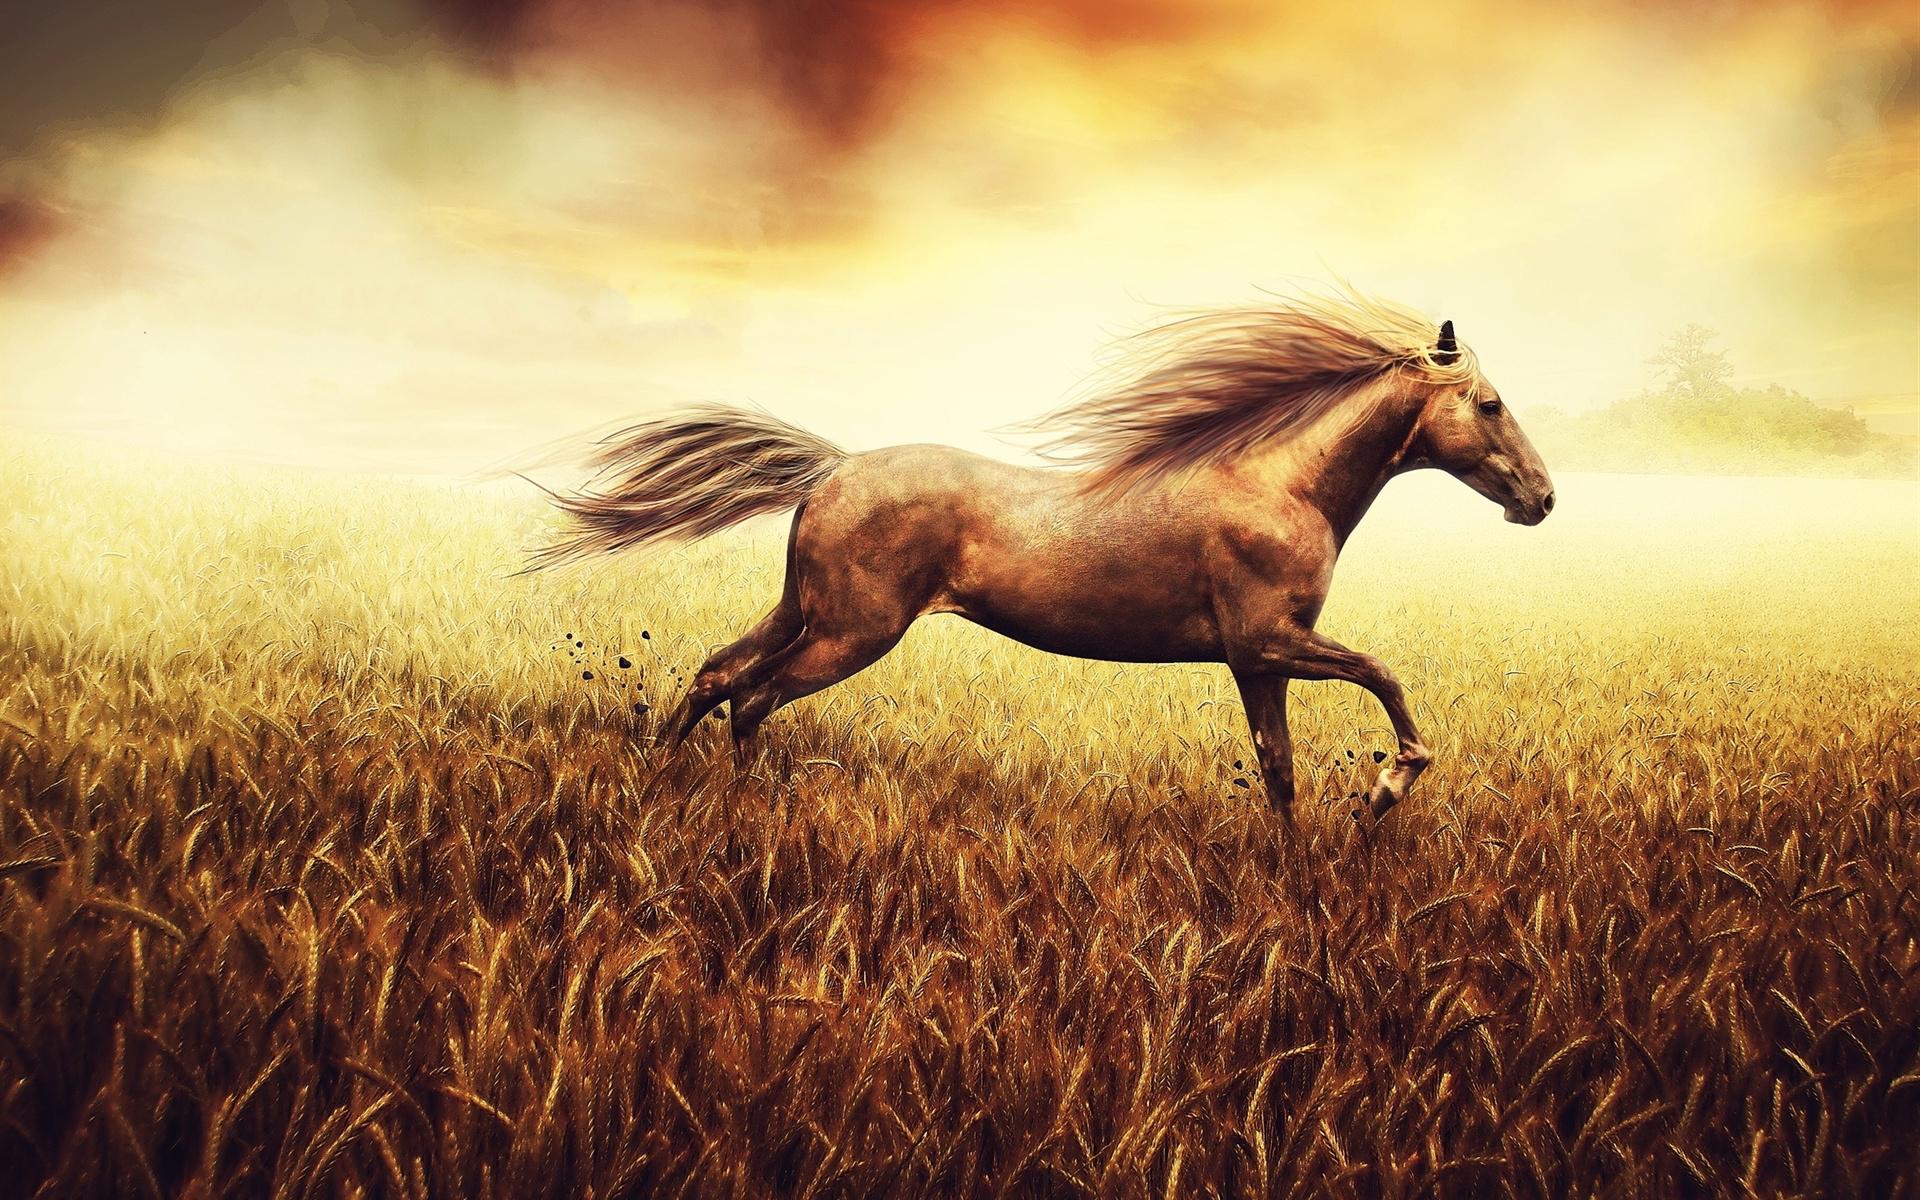 Horse cornfield